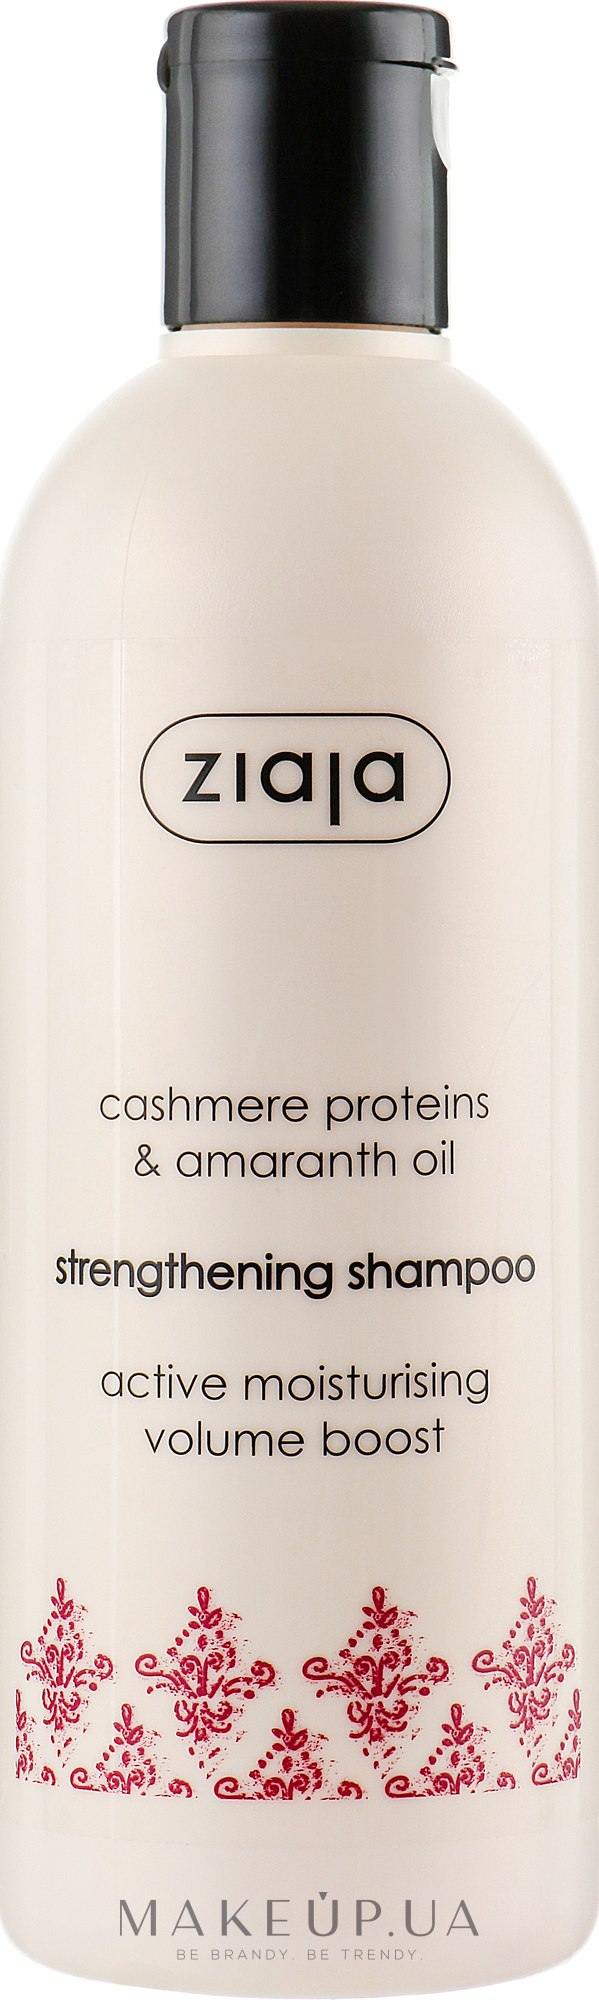 Шампунь укрепляющий с протеинами кашемира - Ziaja Cashmere Proteins Strengthening Shampoo — фото 300ml